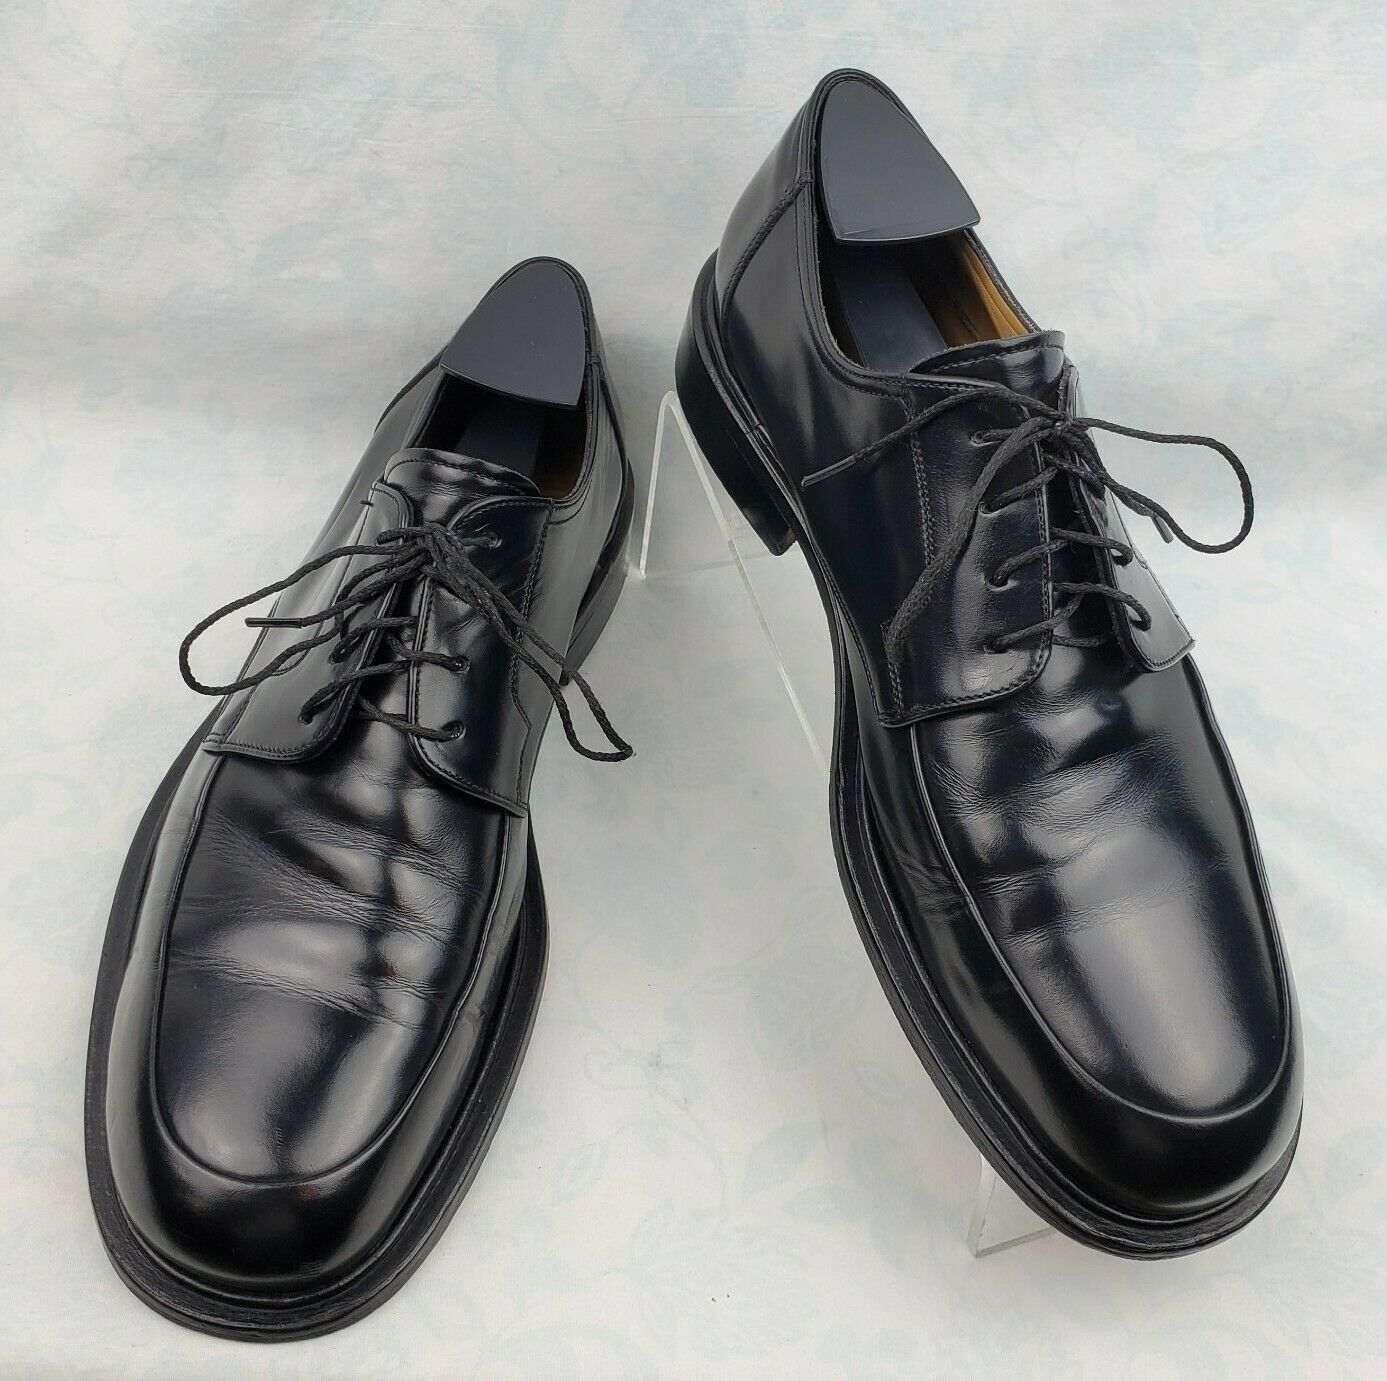 Johnston & Murphy Black Leather Moc Toe Laces Oxford Shoes Men's Size 8.5M Italy